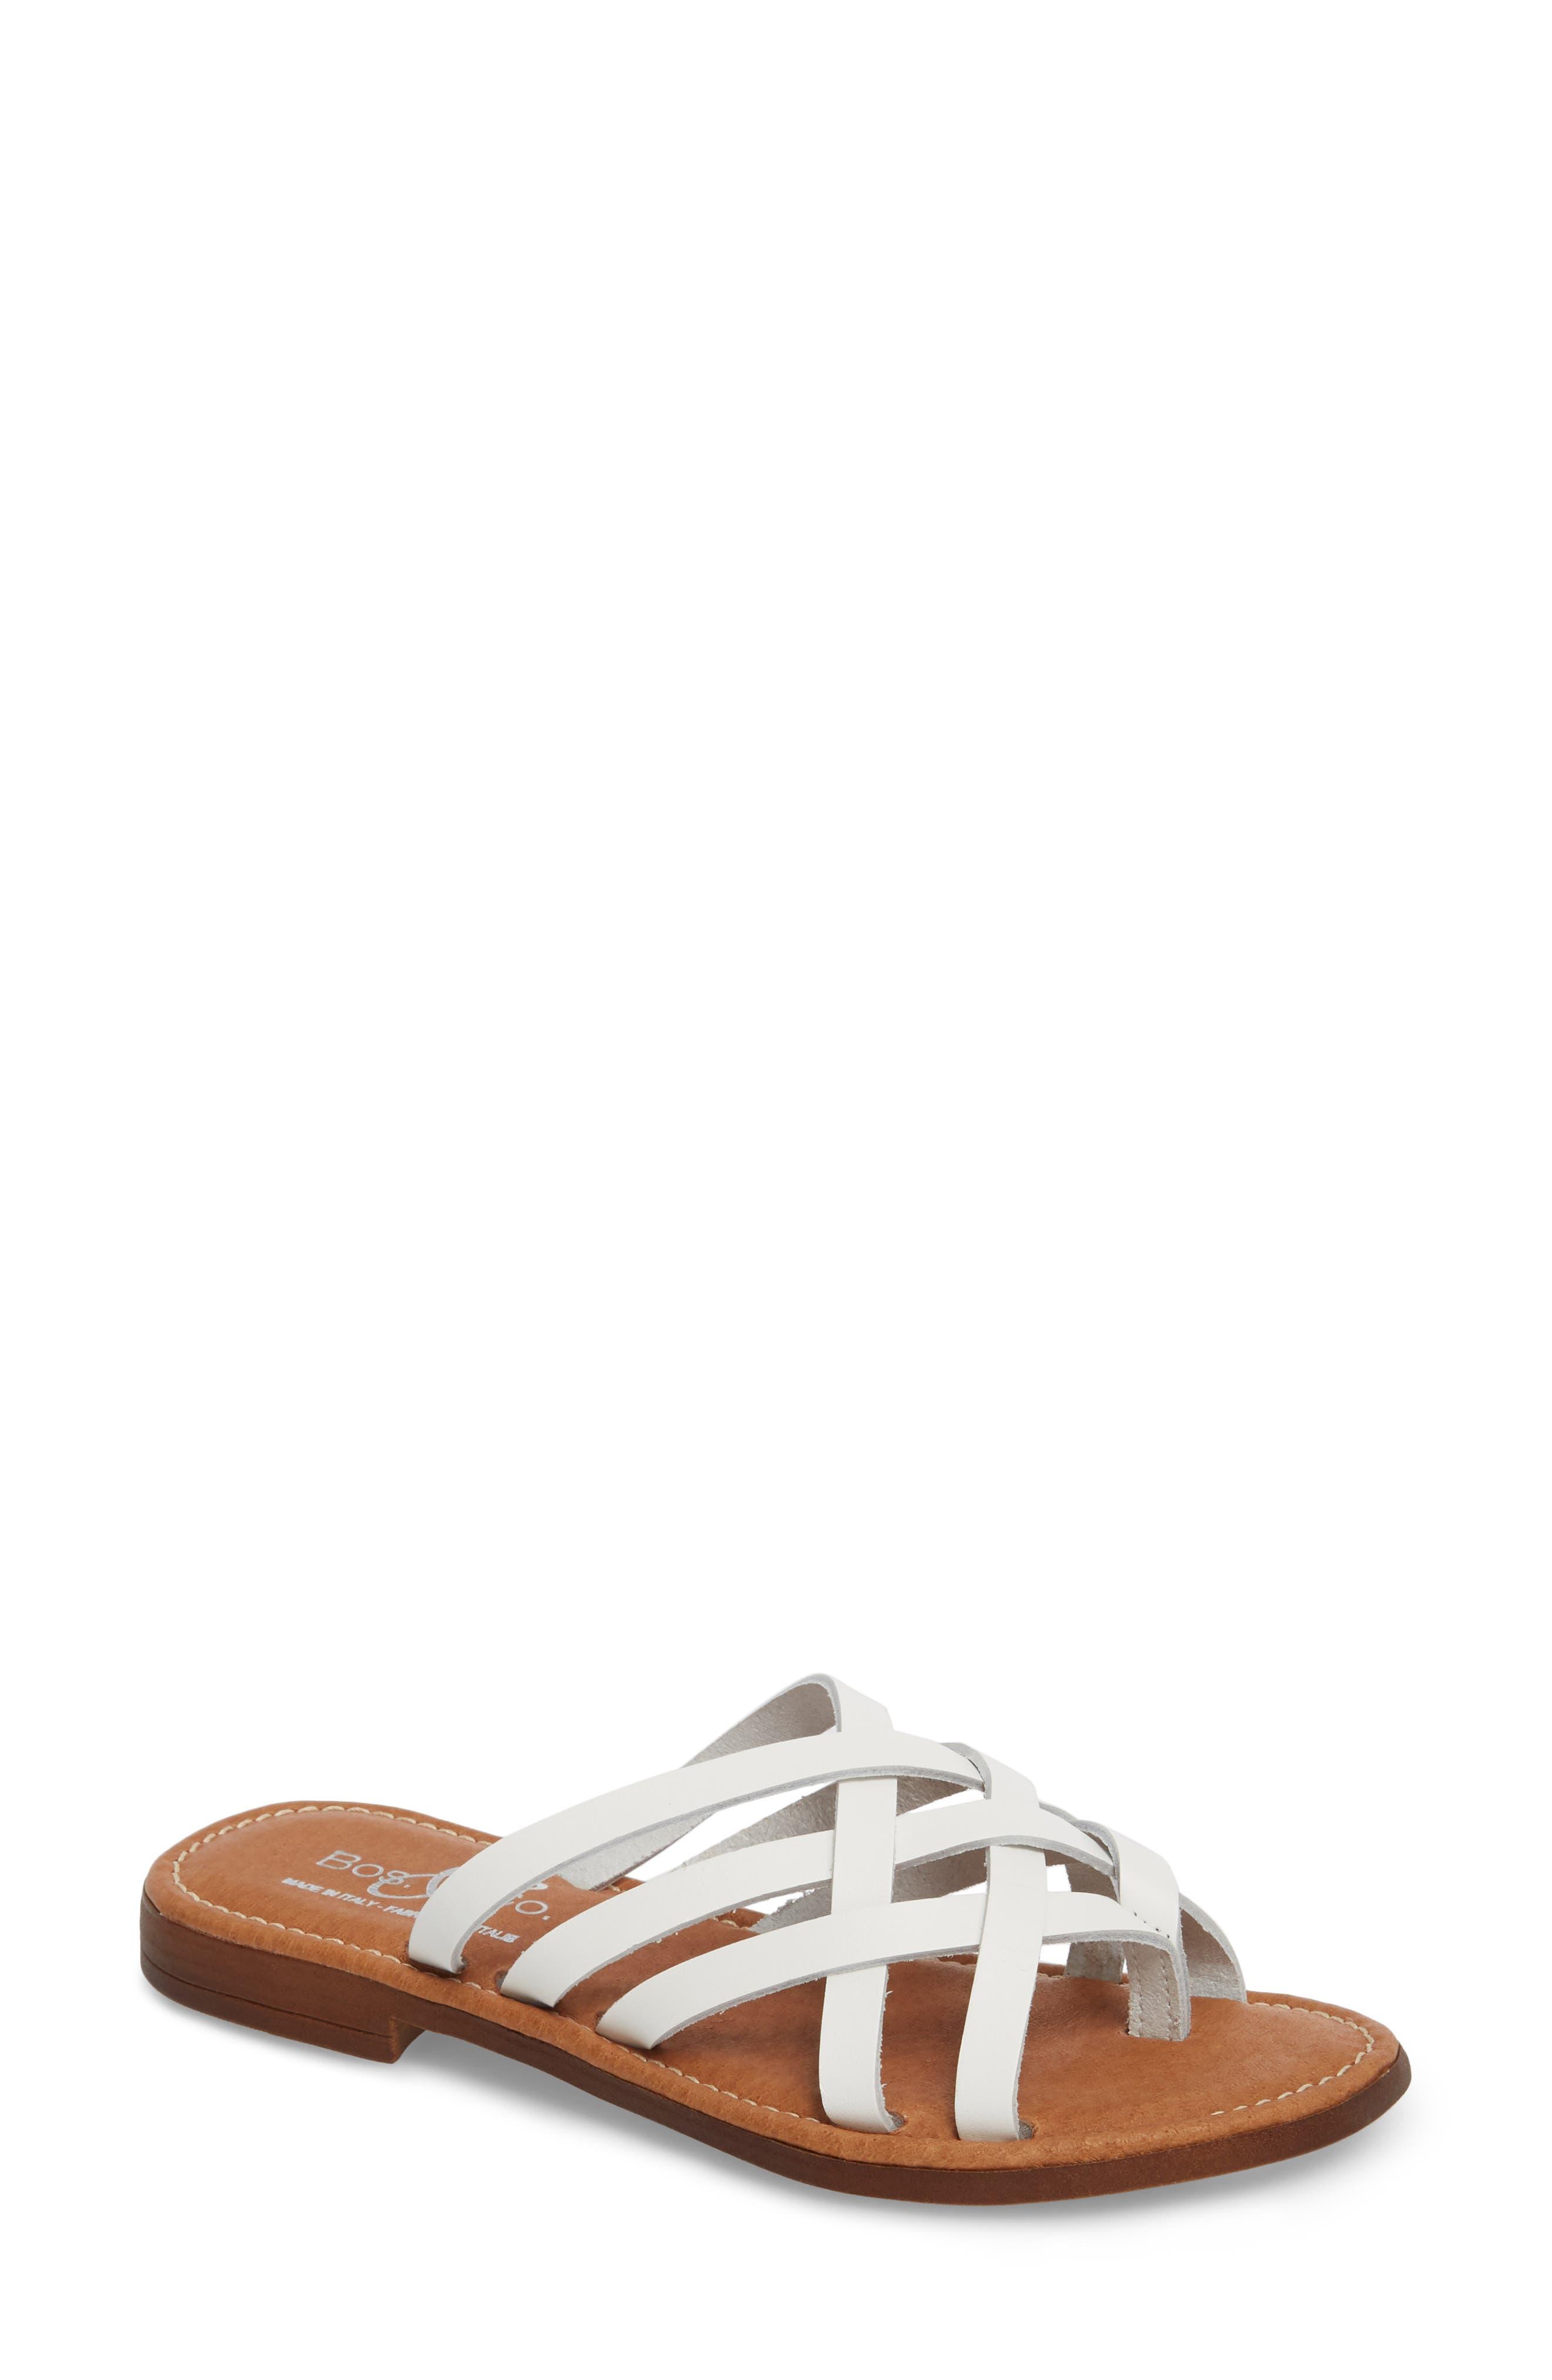 Bos. & Co. Inola Slide Sandal, White